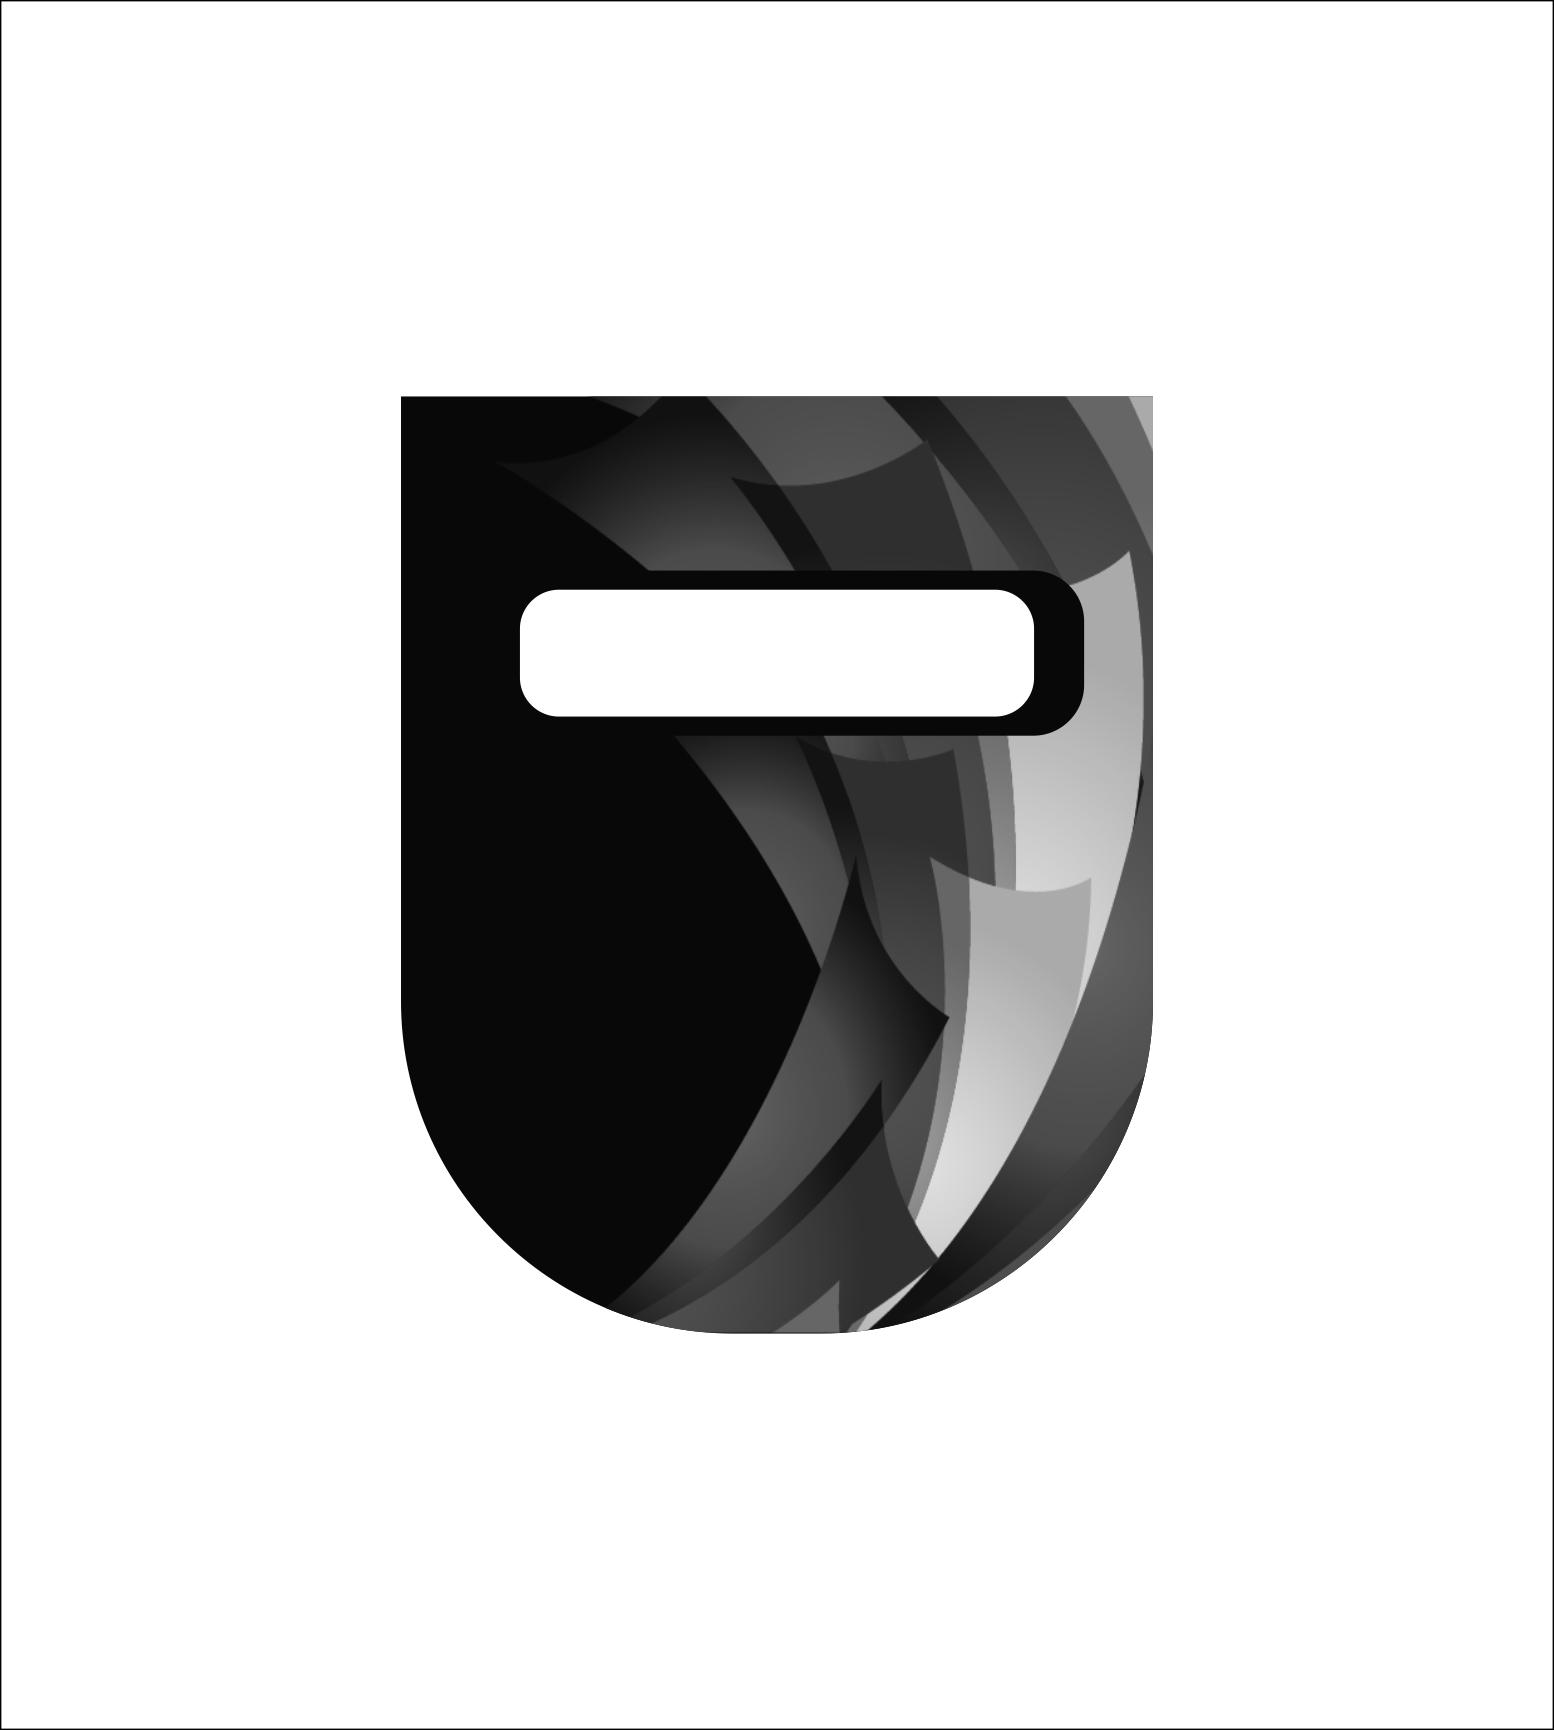 Разработка логотипа для Конкурса фото f_8995f6cef2b420f7.jpg